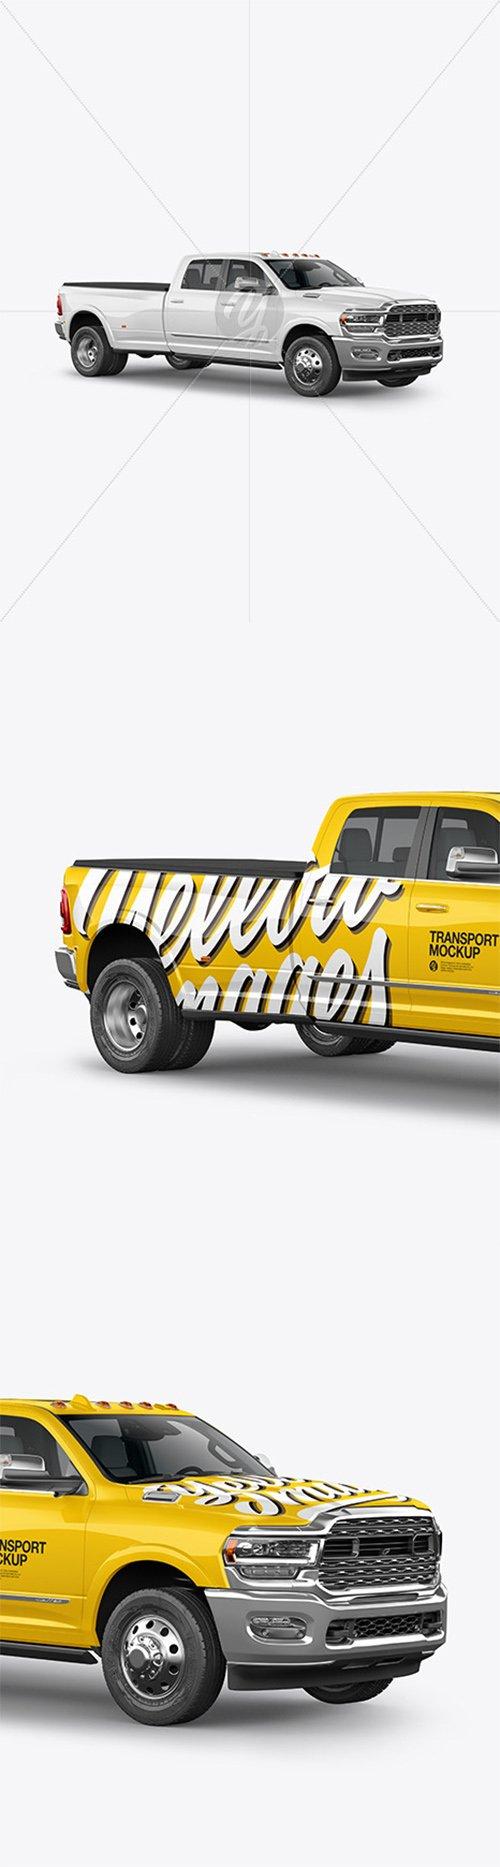 Pickup Truck Mockup - Half Side View 64087